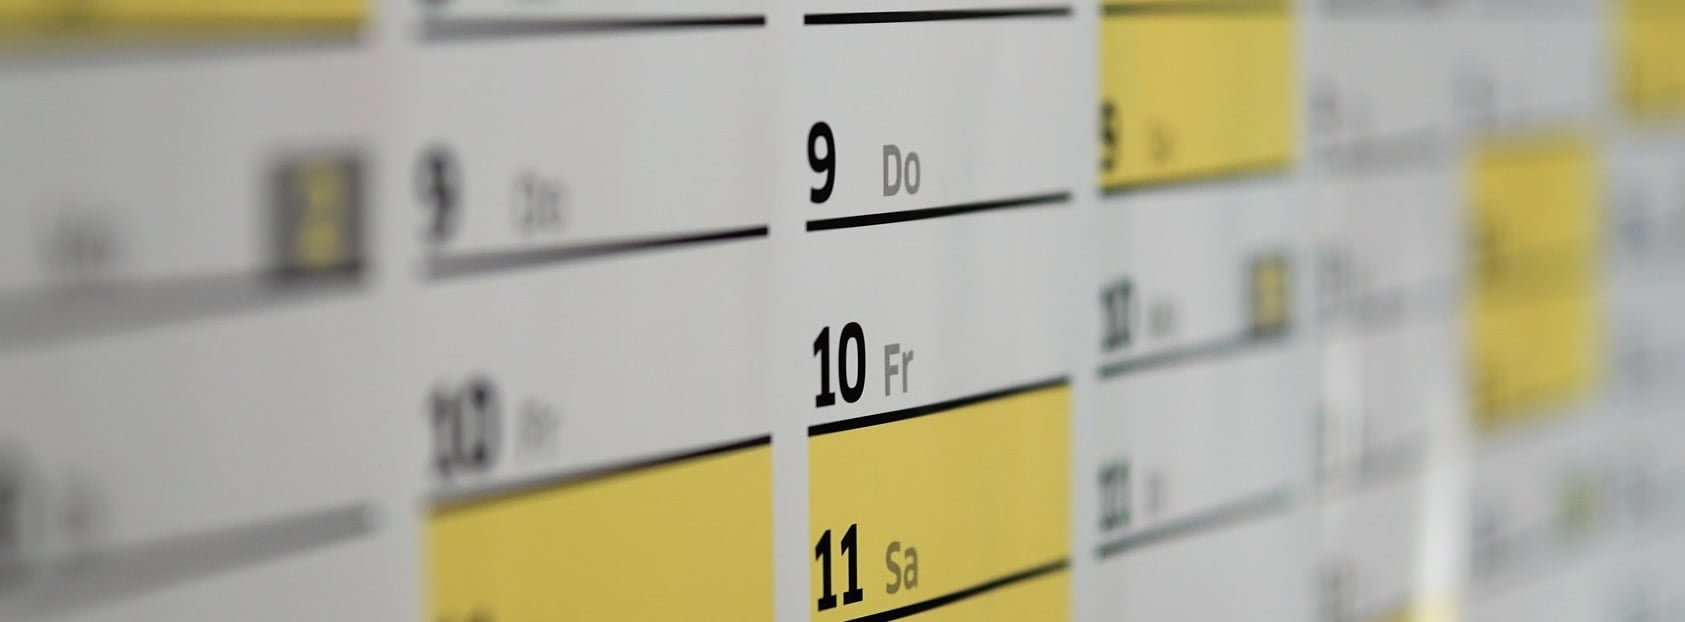 calendar-online-booking-system